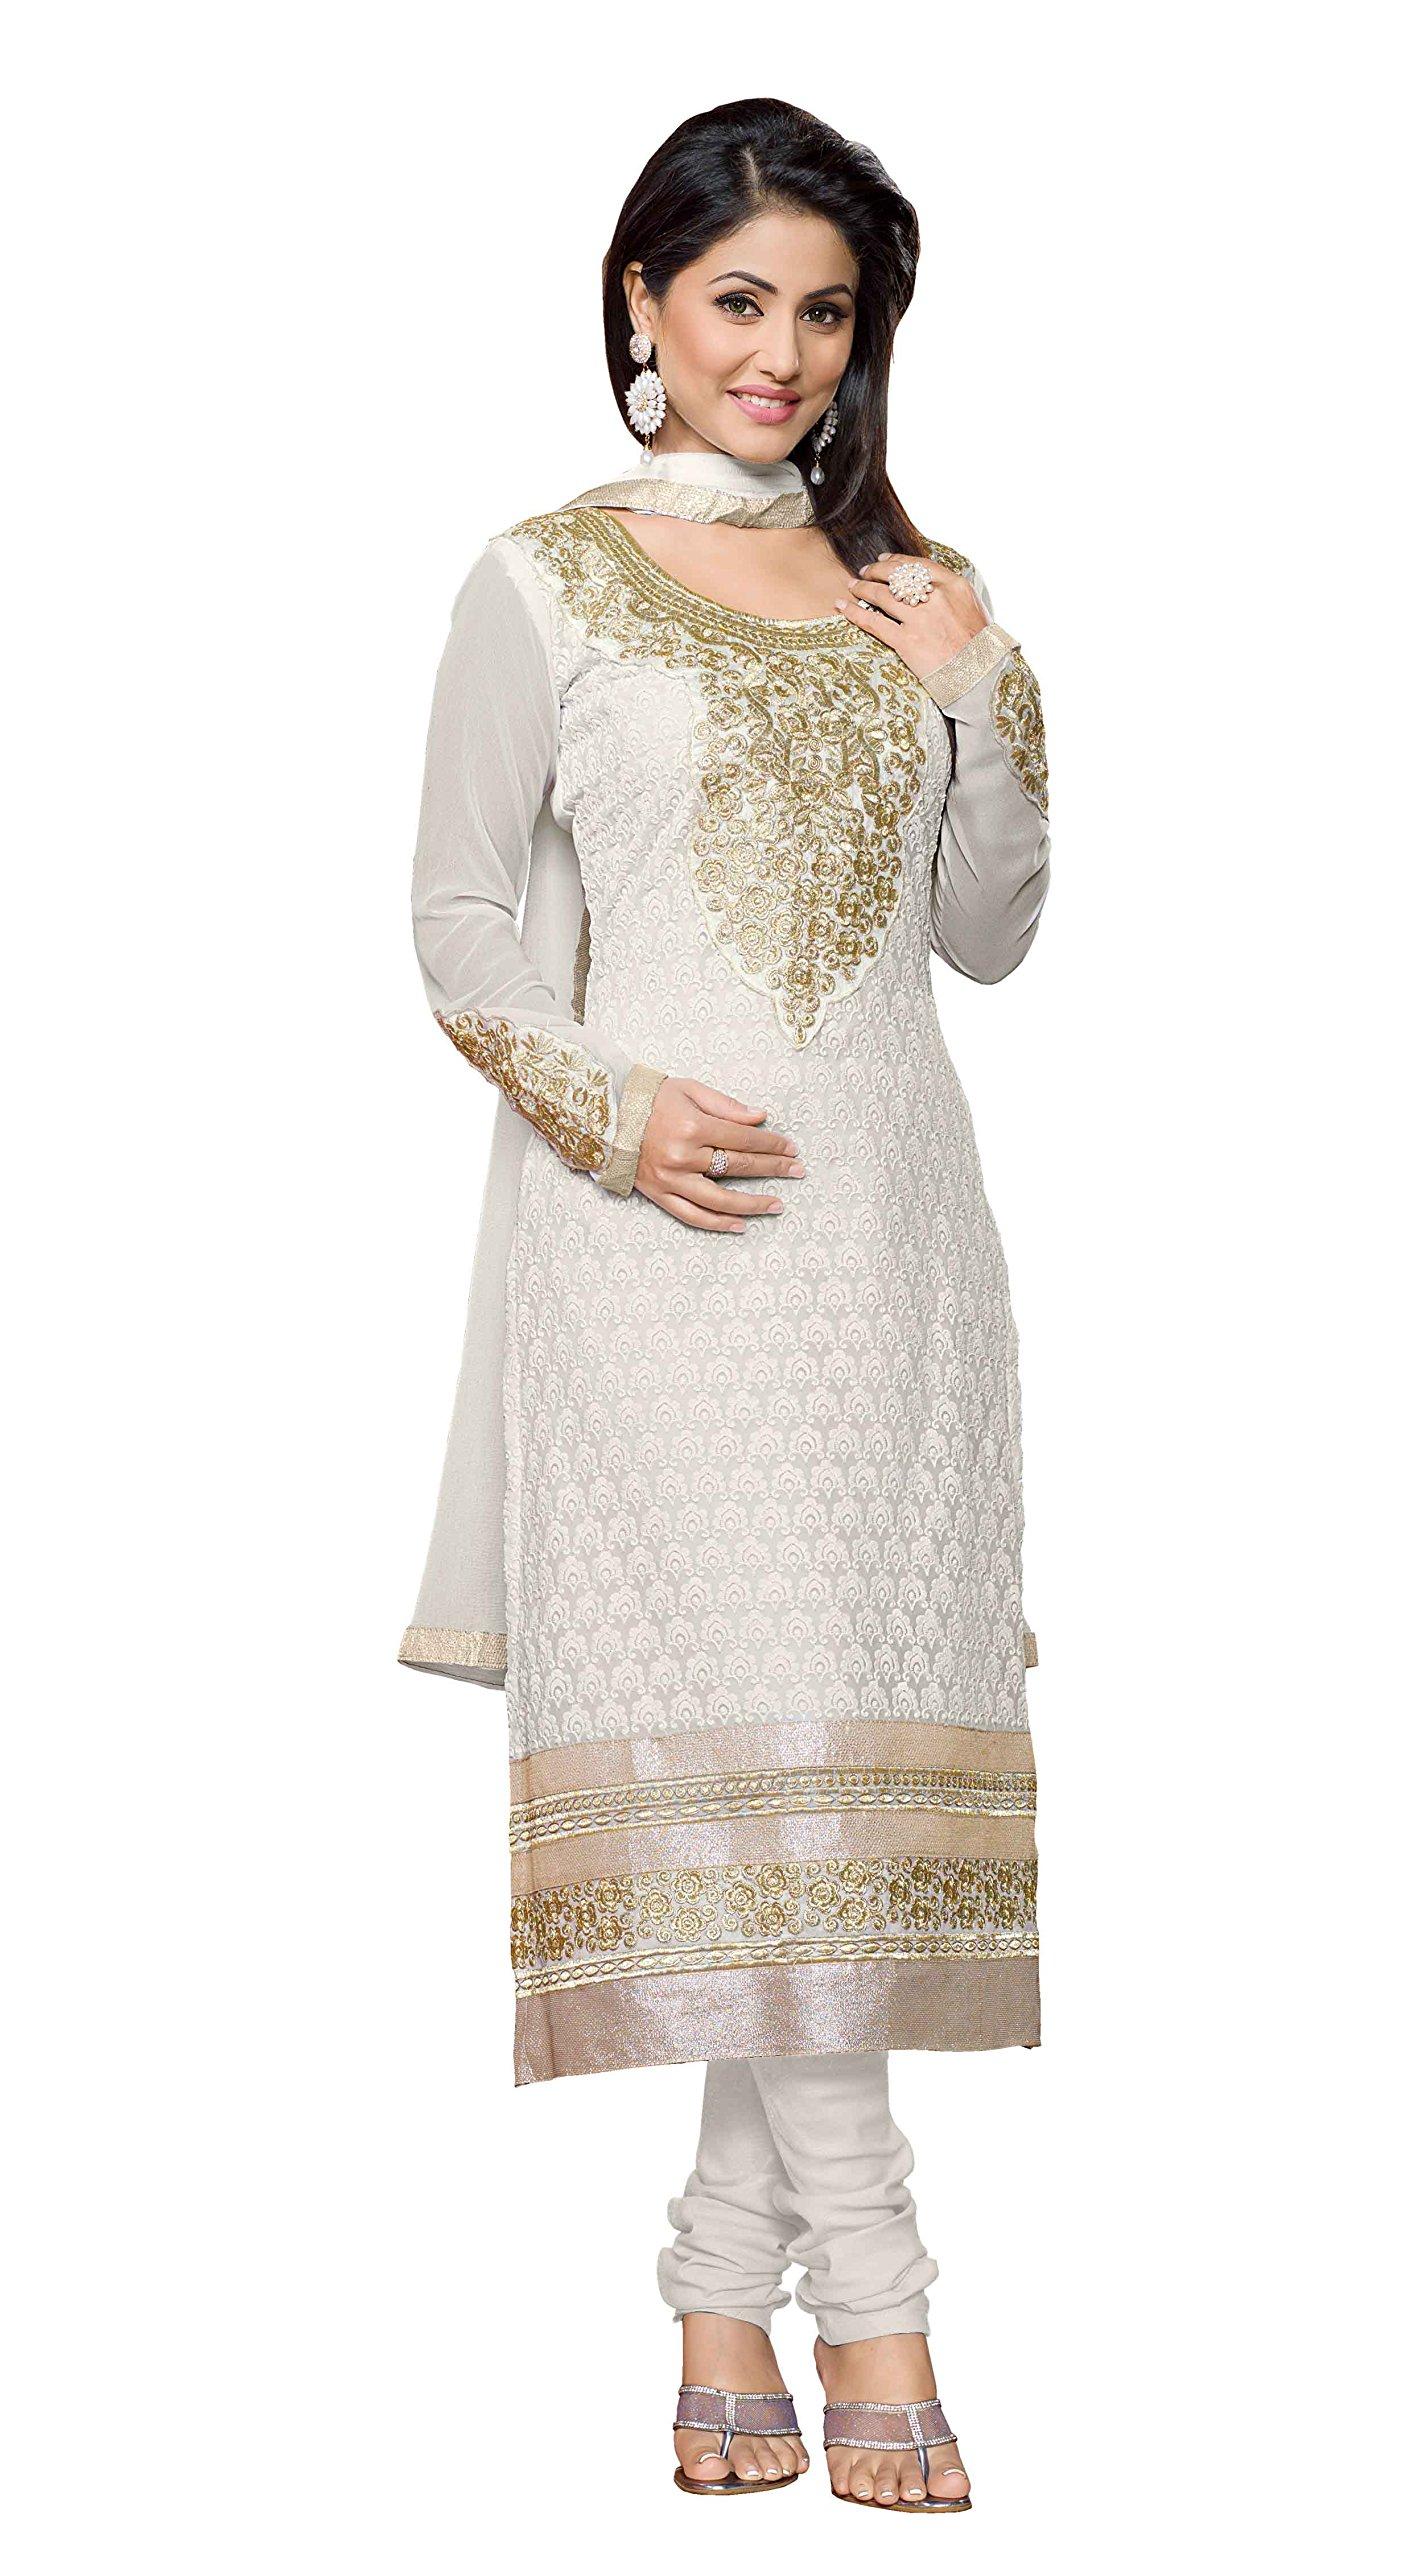 Khushali Women Georgette Karachi Unstitched Salwar Suit Dress Materials (White)